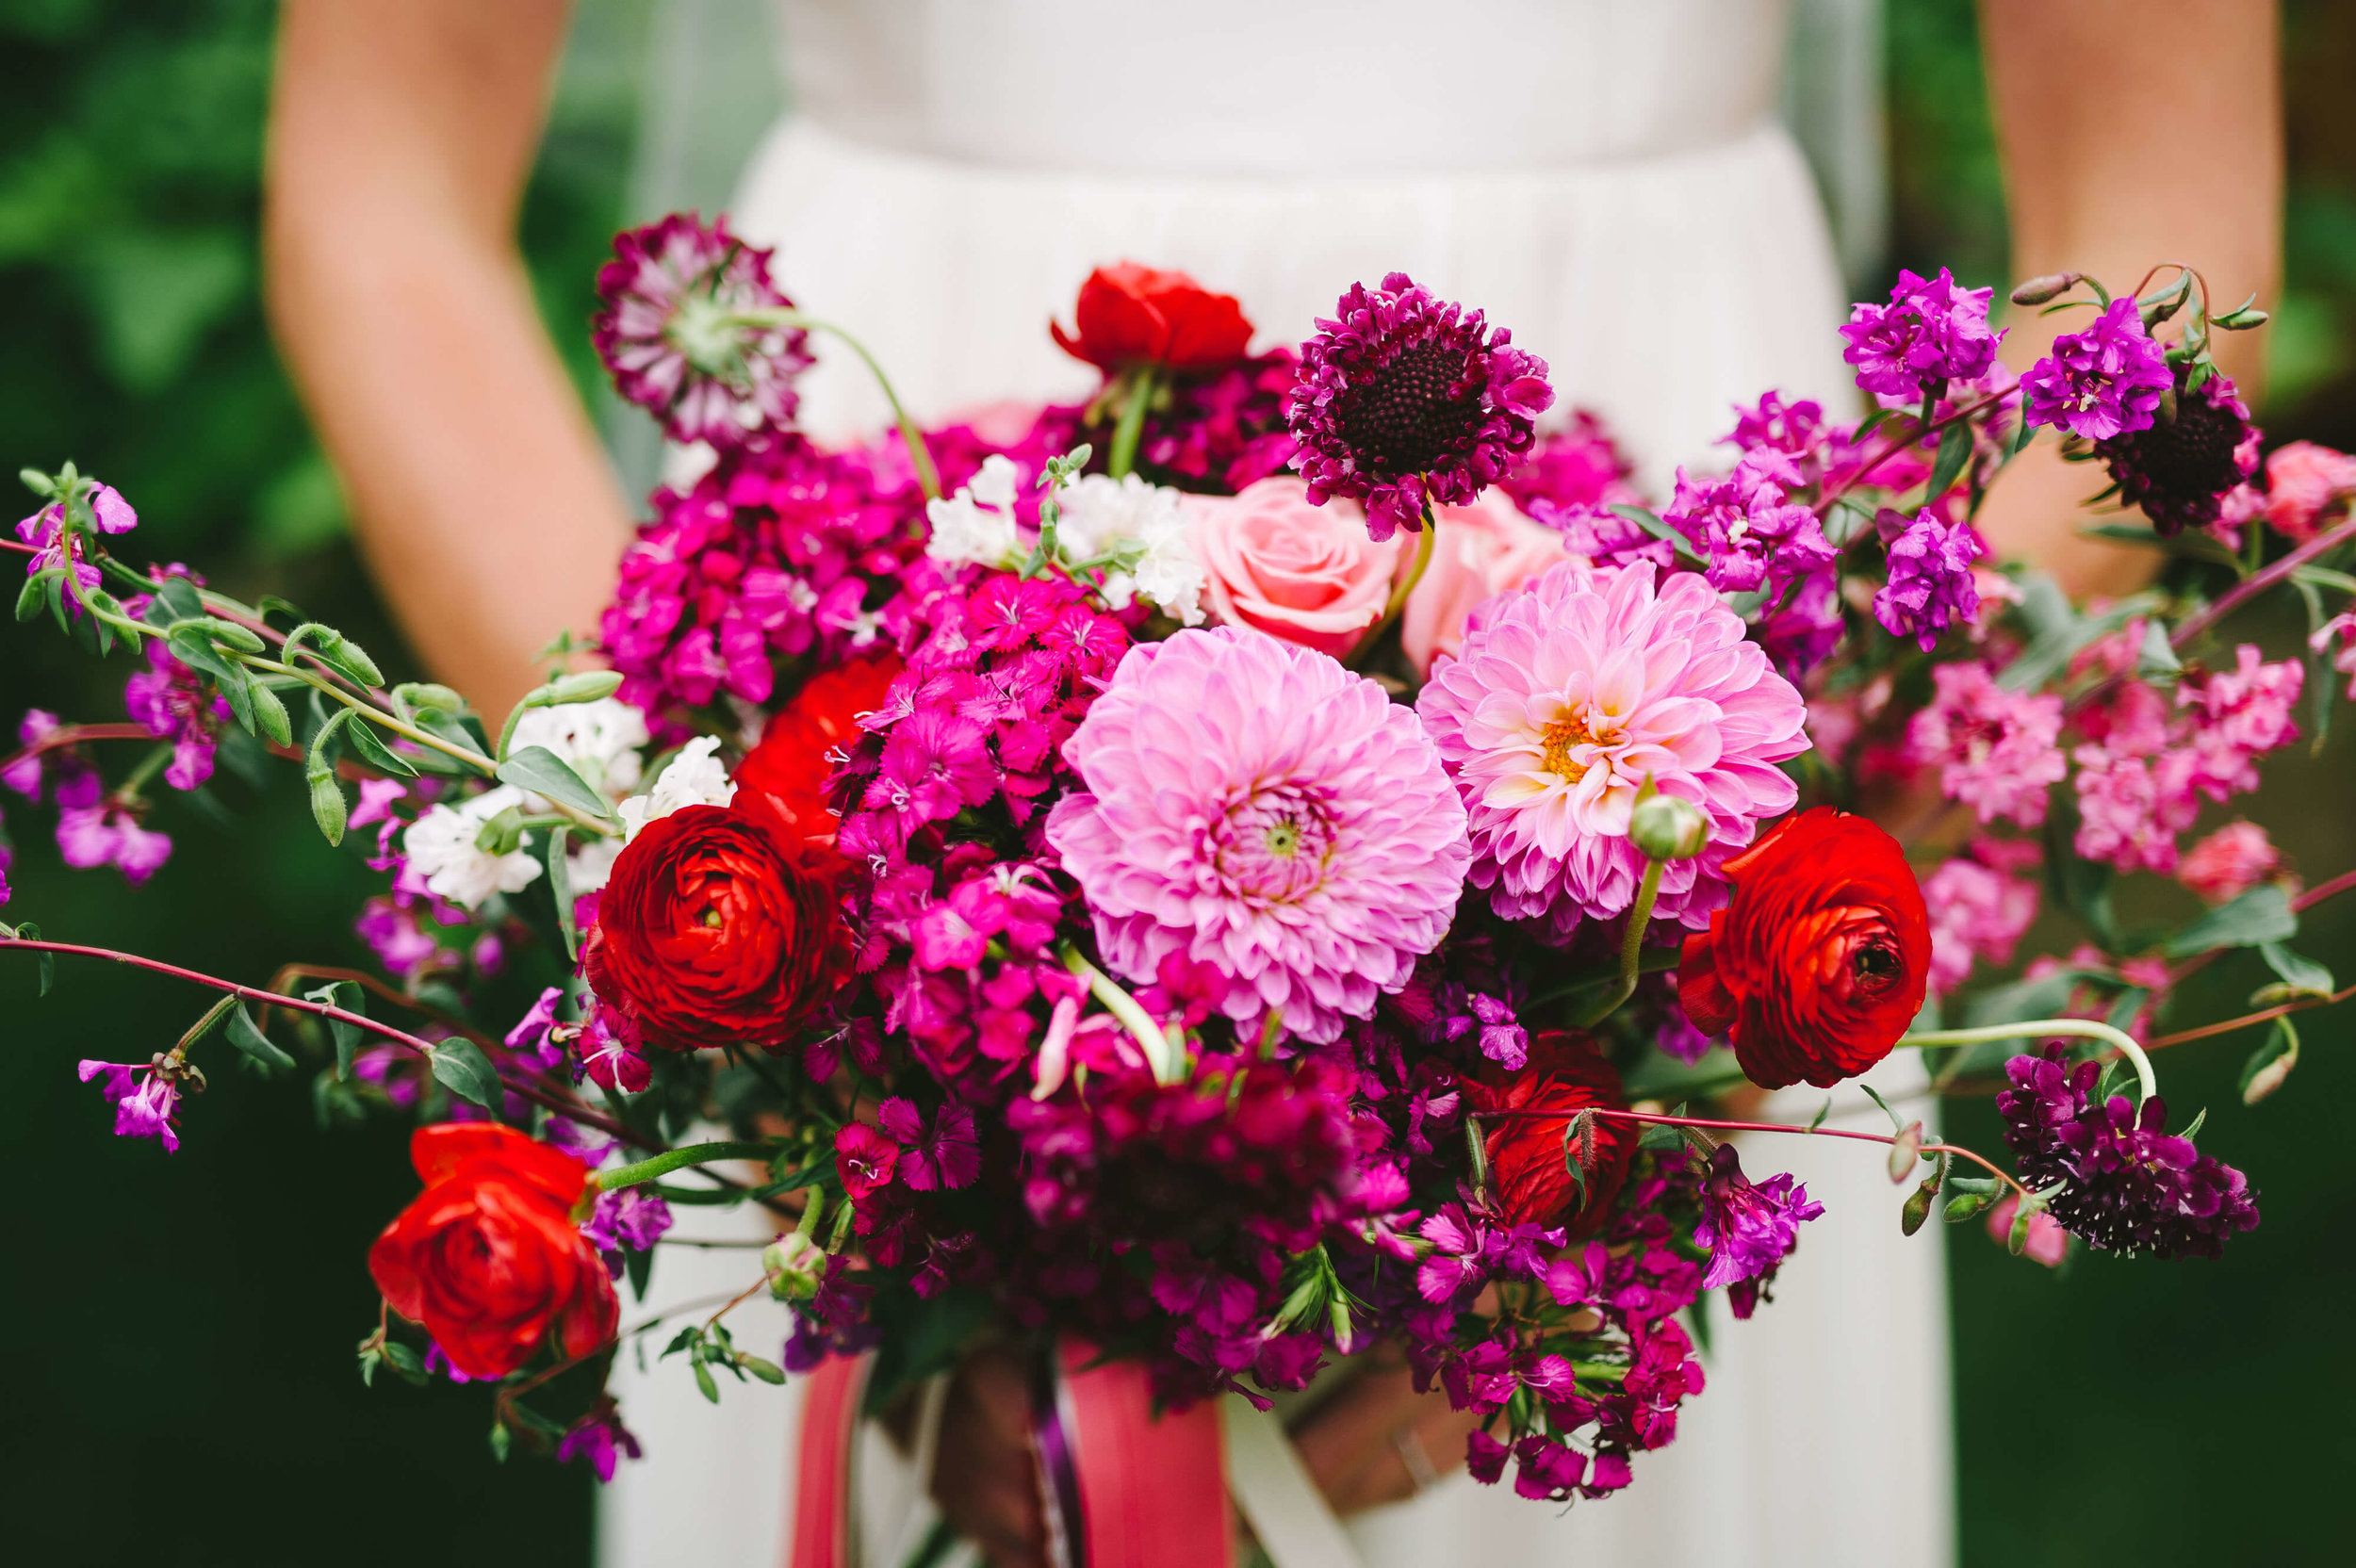 engle-olson-fran-ze-photo-montana-wedding-15.jpg